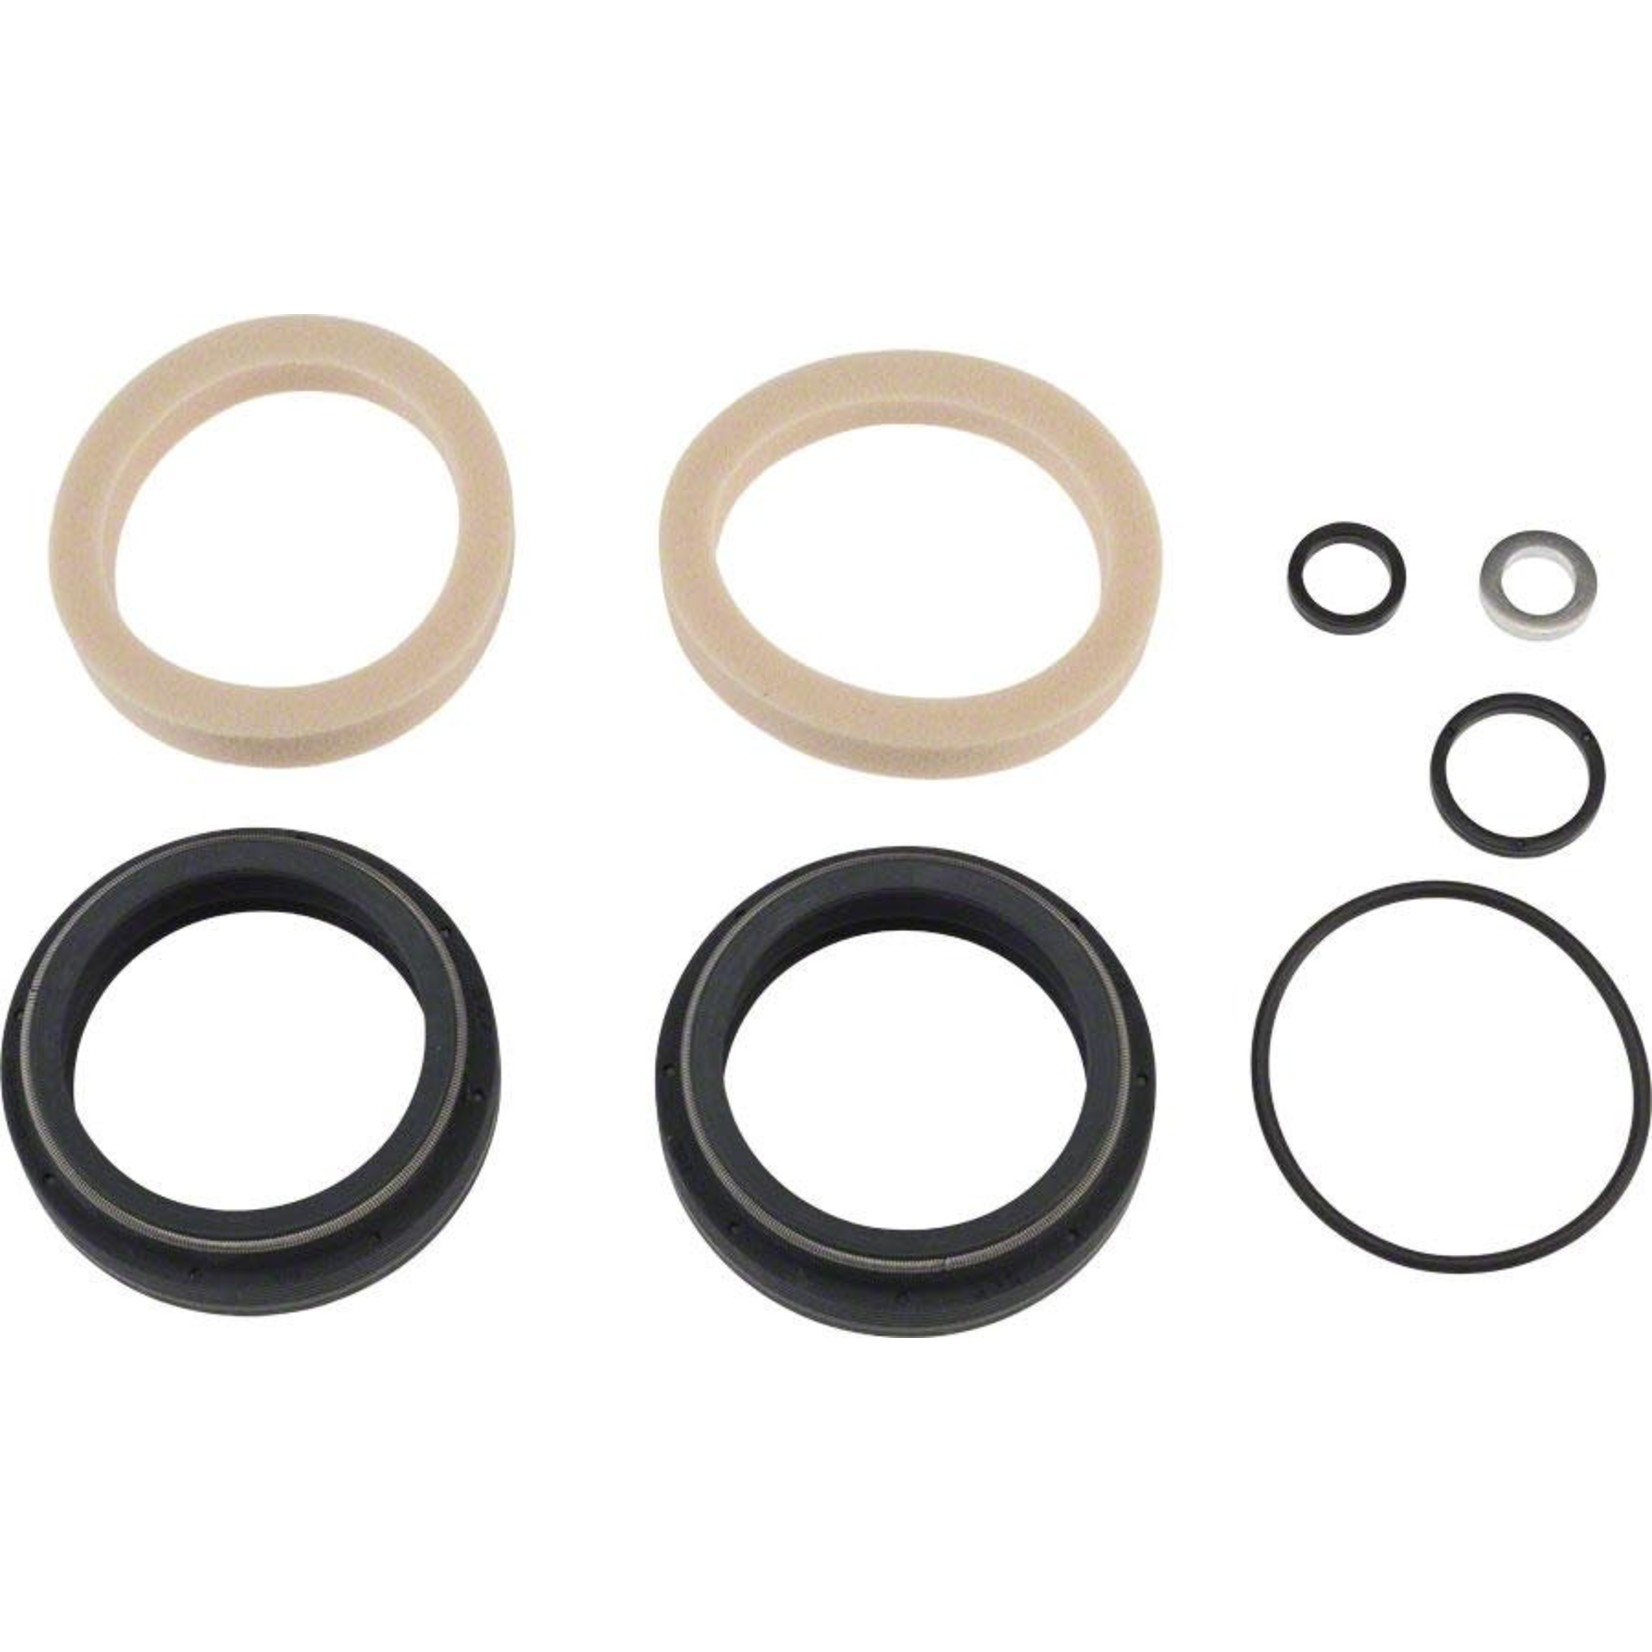 FOX 34mm Fork Low Friction Flangeless Dust Wiper Kit